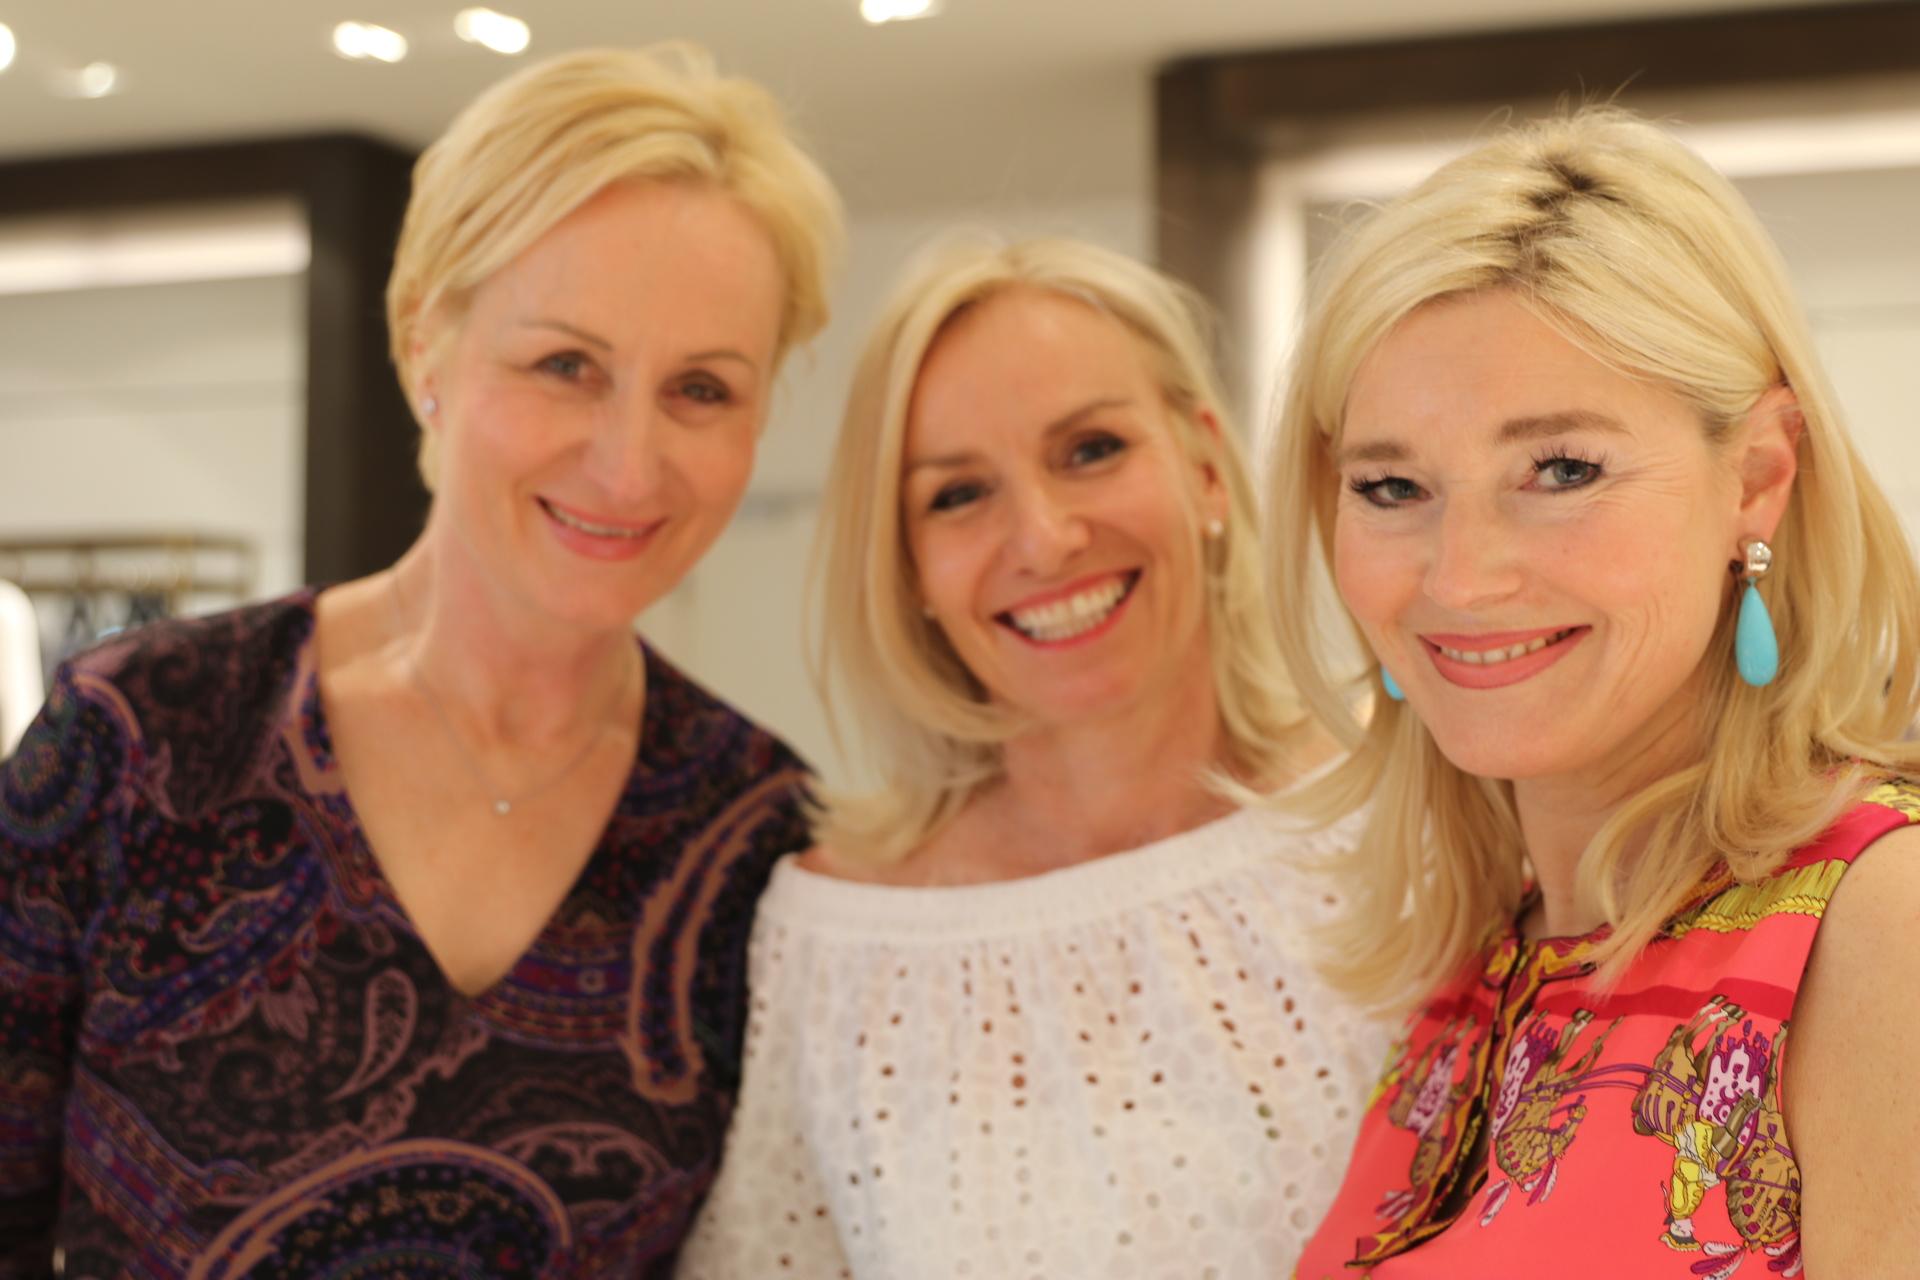 Marion Bock, Petra Schlösser, Petra Dieners, Fashion-Blog Lieblingsstil, Lieblingsstil.com,